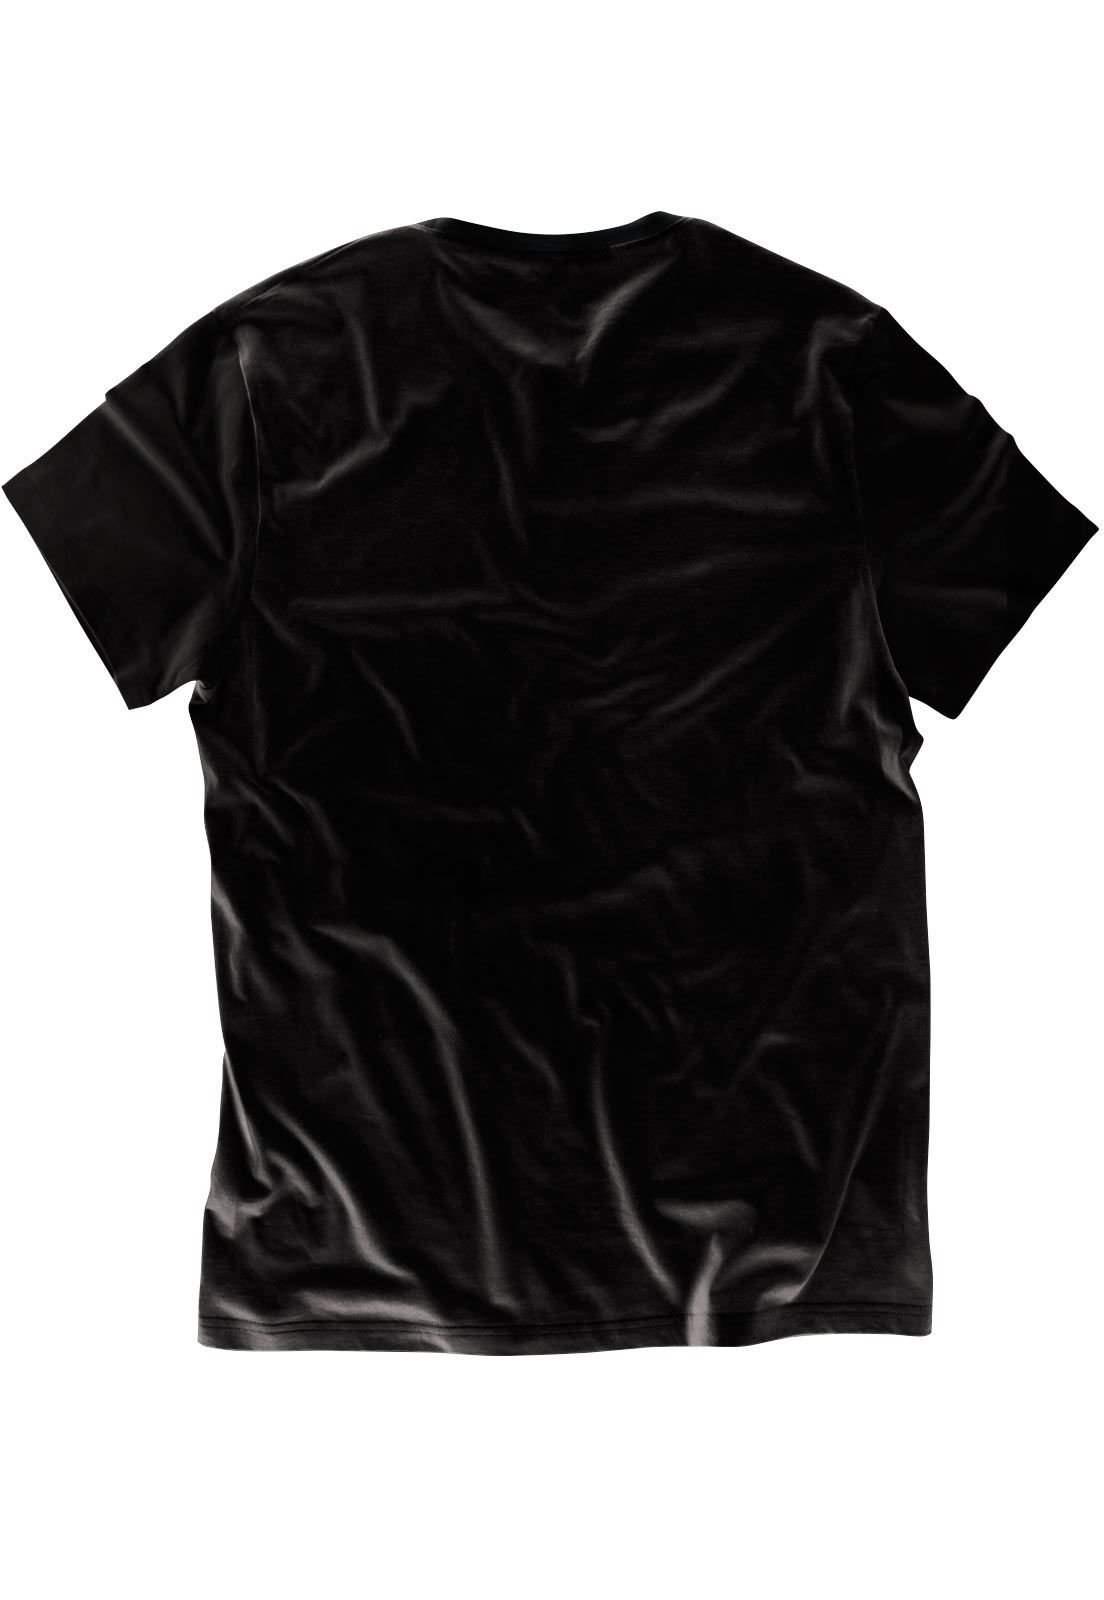 Camiseta ElephunK Estampada LOL Jeans Tumblr Preta